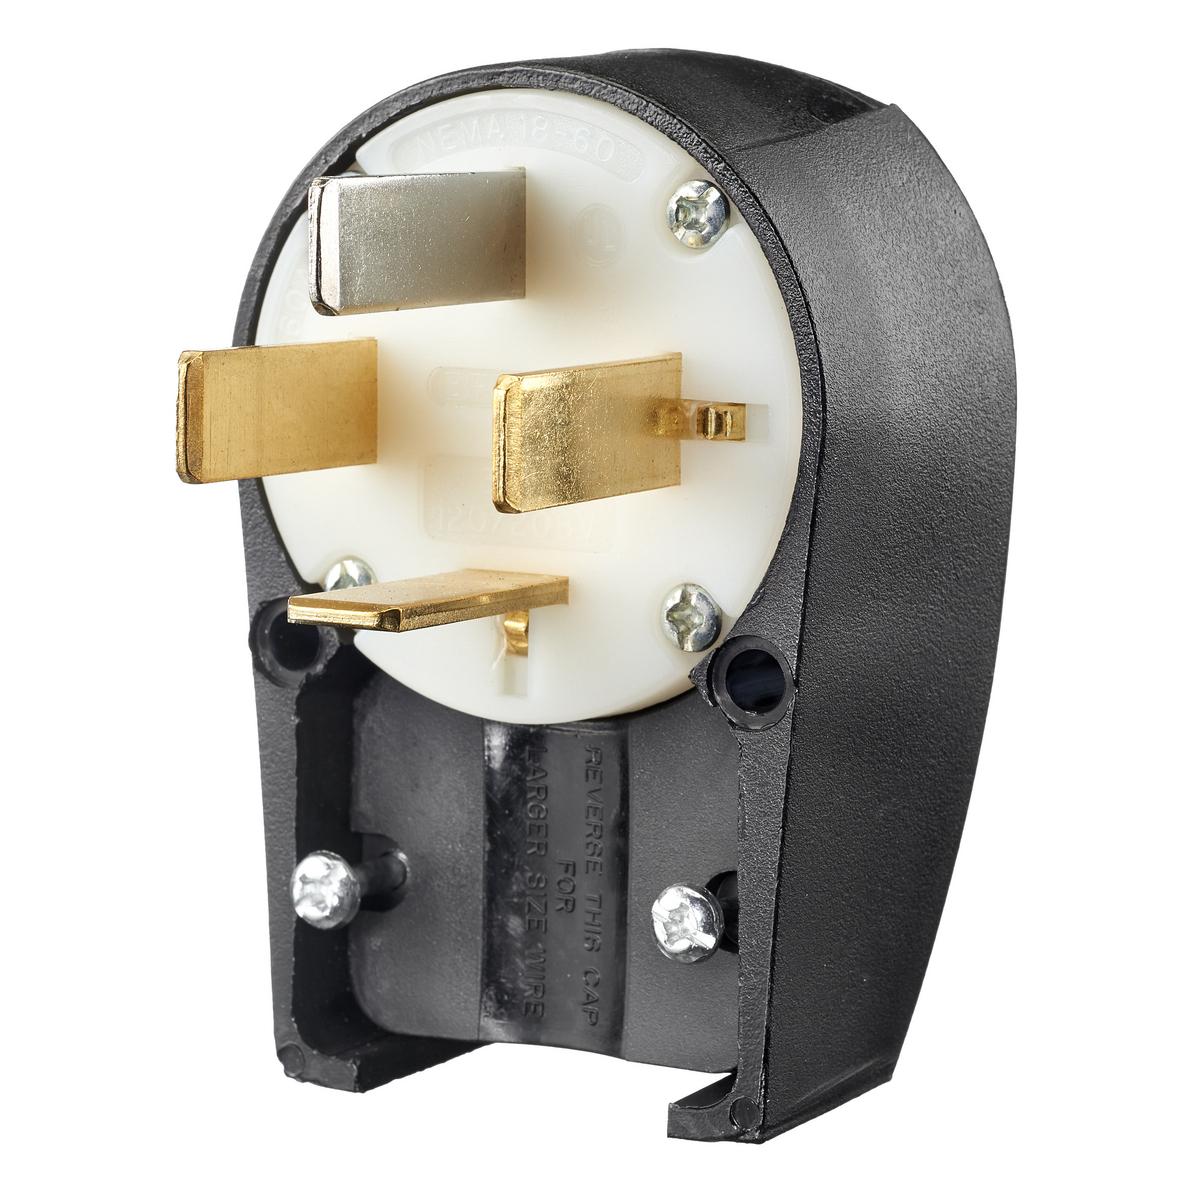 Piece-50 5//16 x 3 Hard-to-Find Fastener 014973237080 Concrete Wedge Anchors